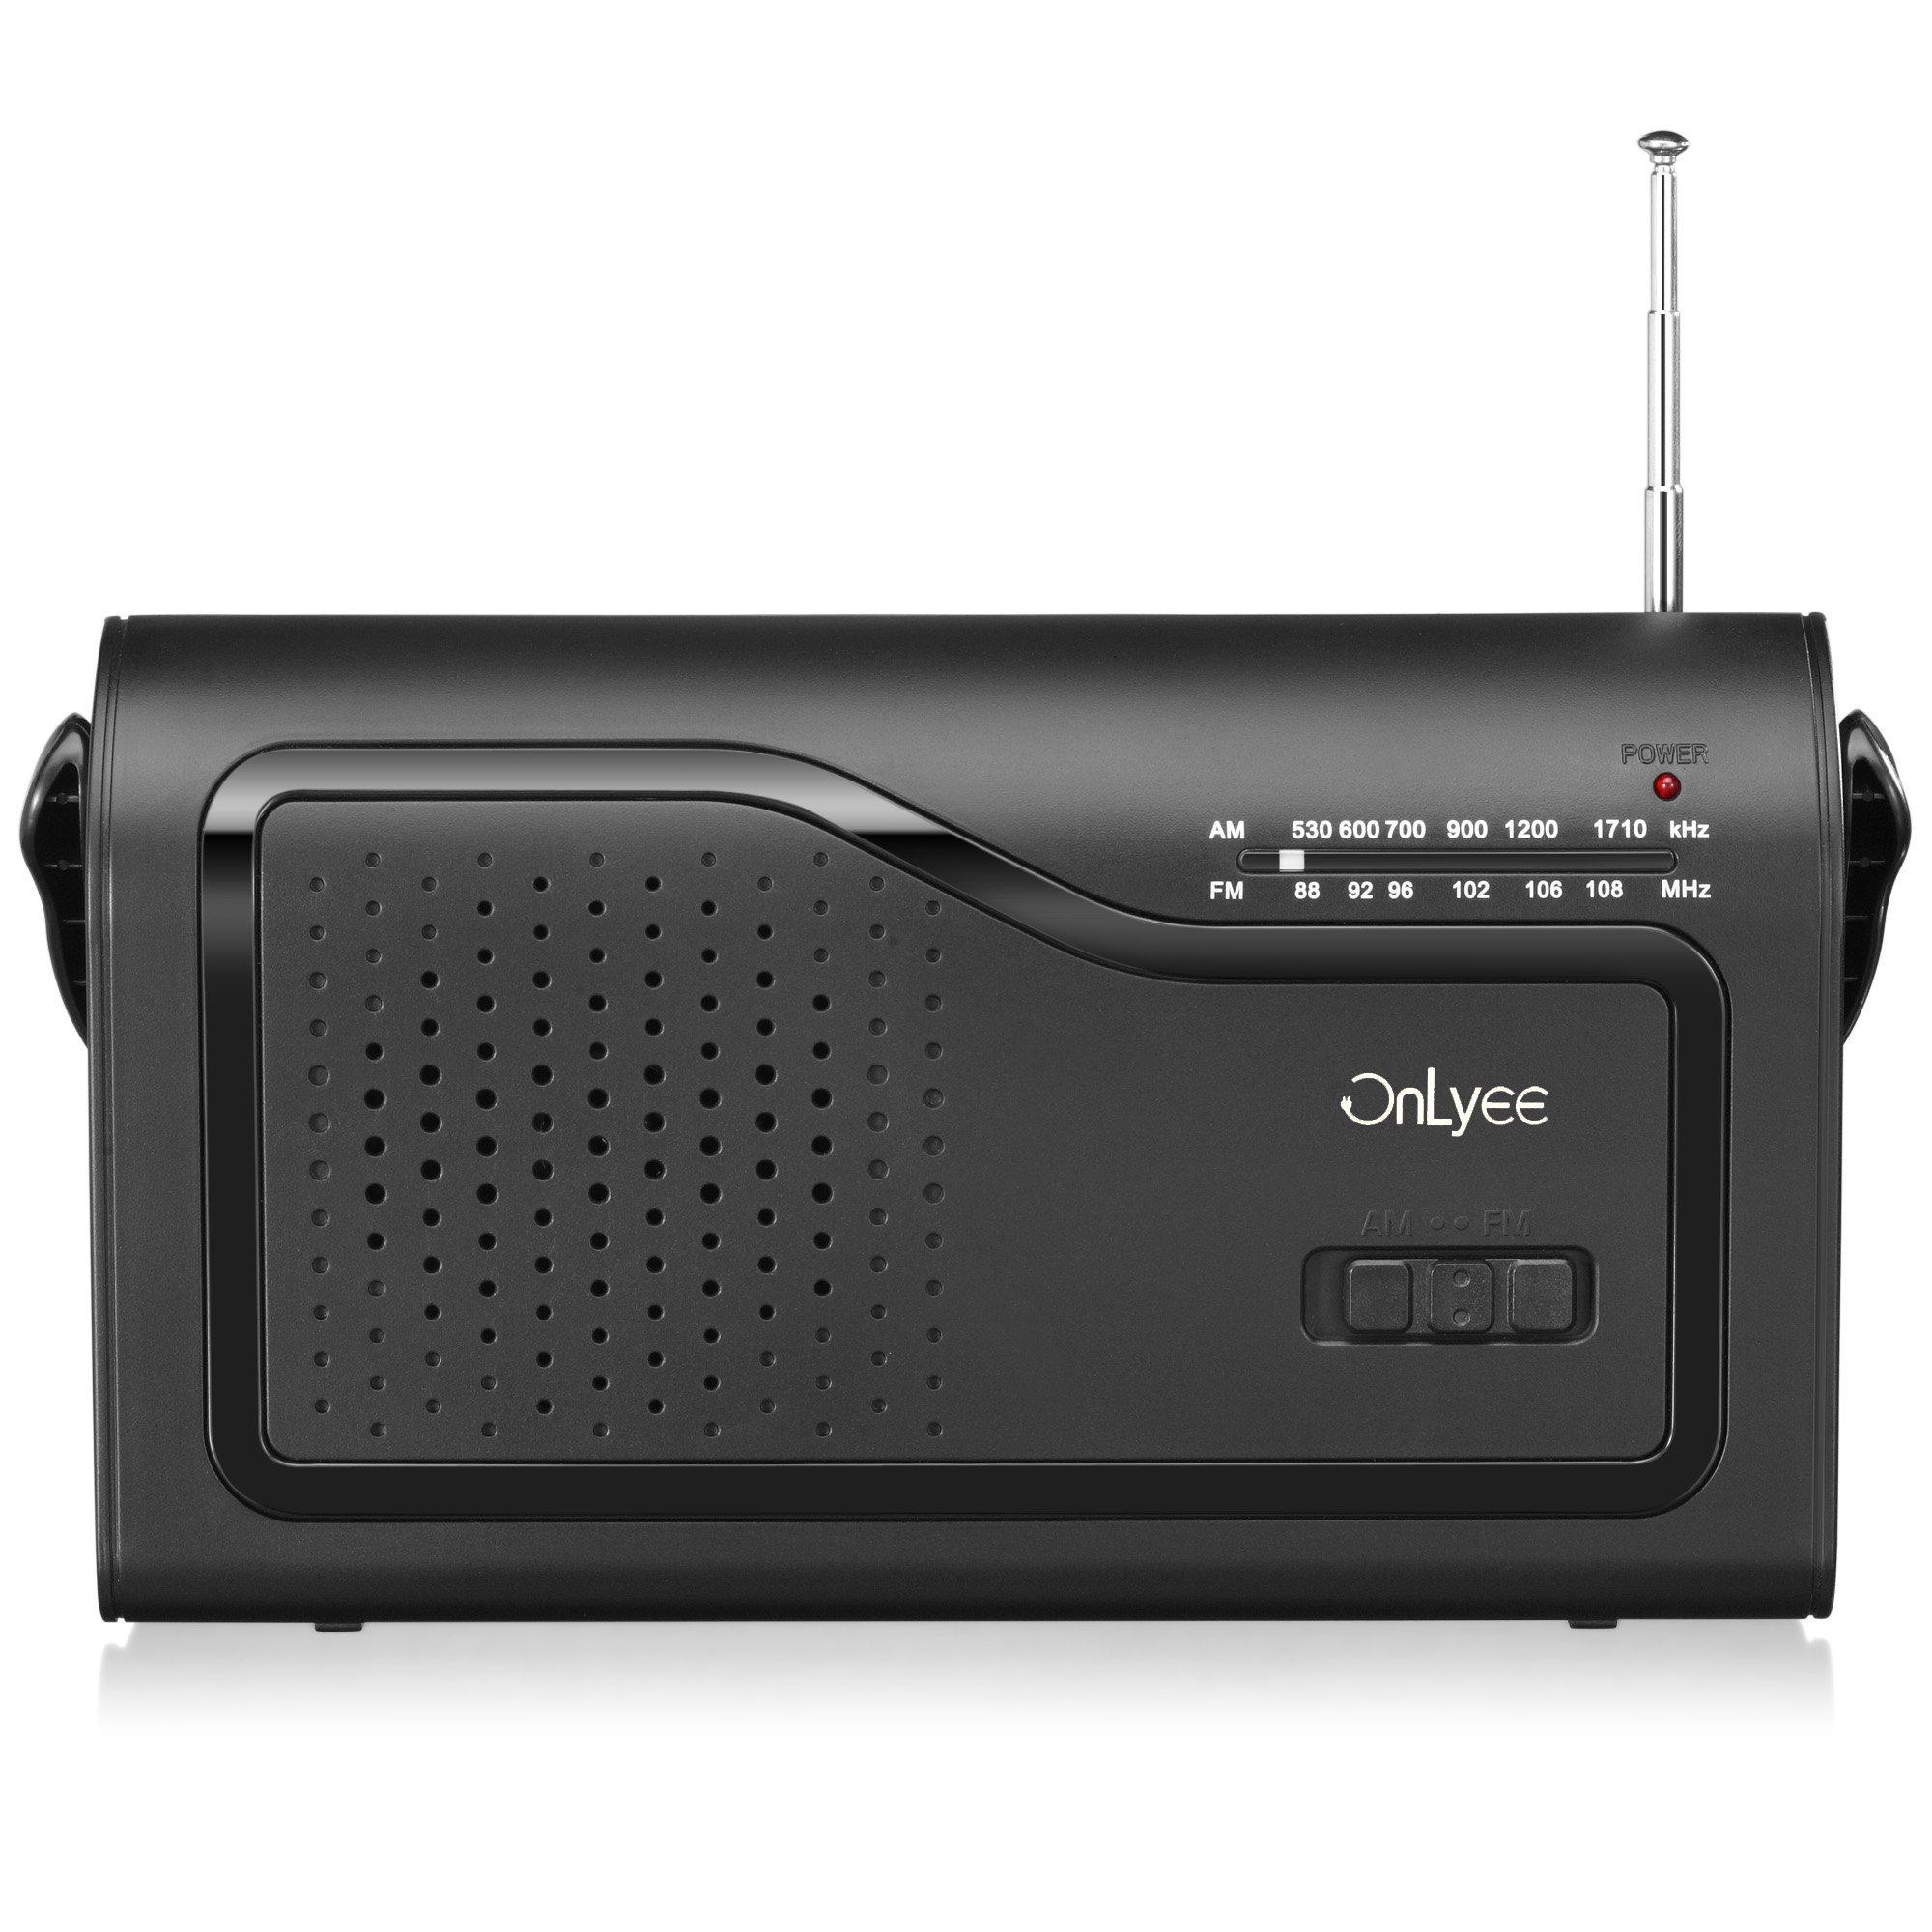 OnLyee AM FM Portable Radio (Black)